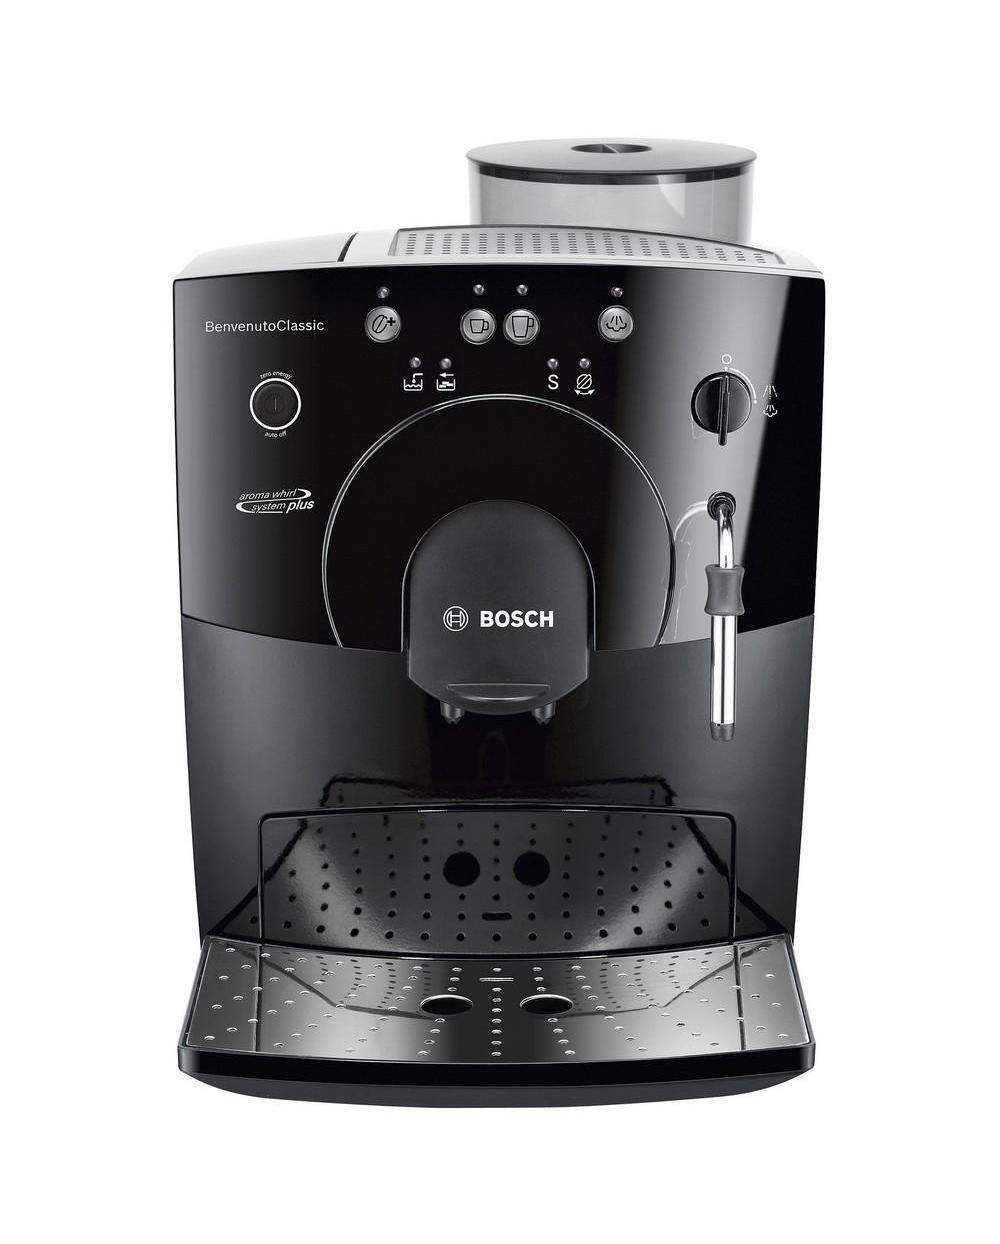 Bosch TCA 5309 кофемашина, Bosch GmbH